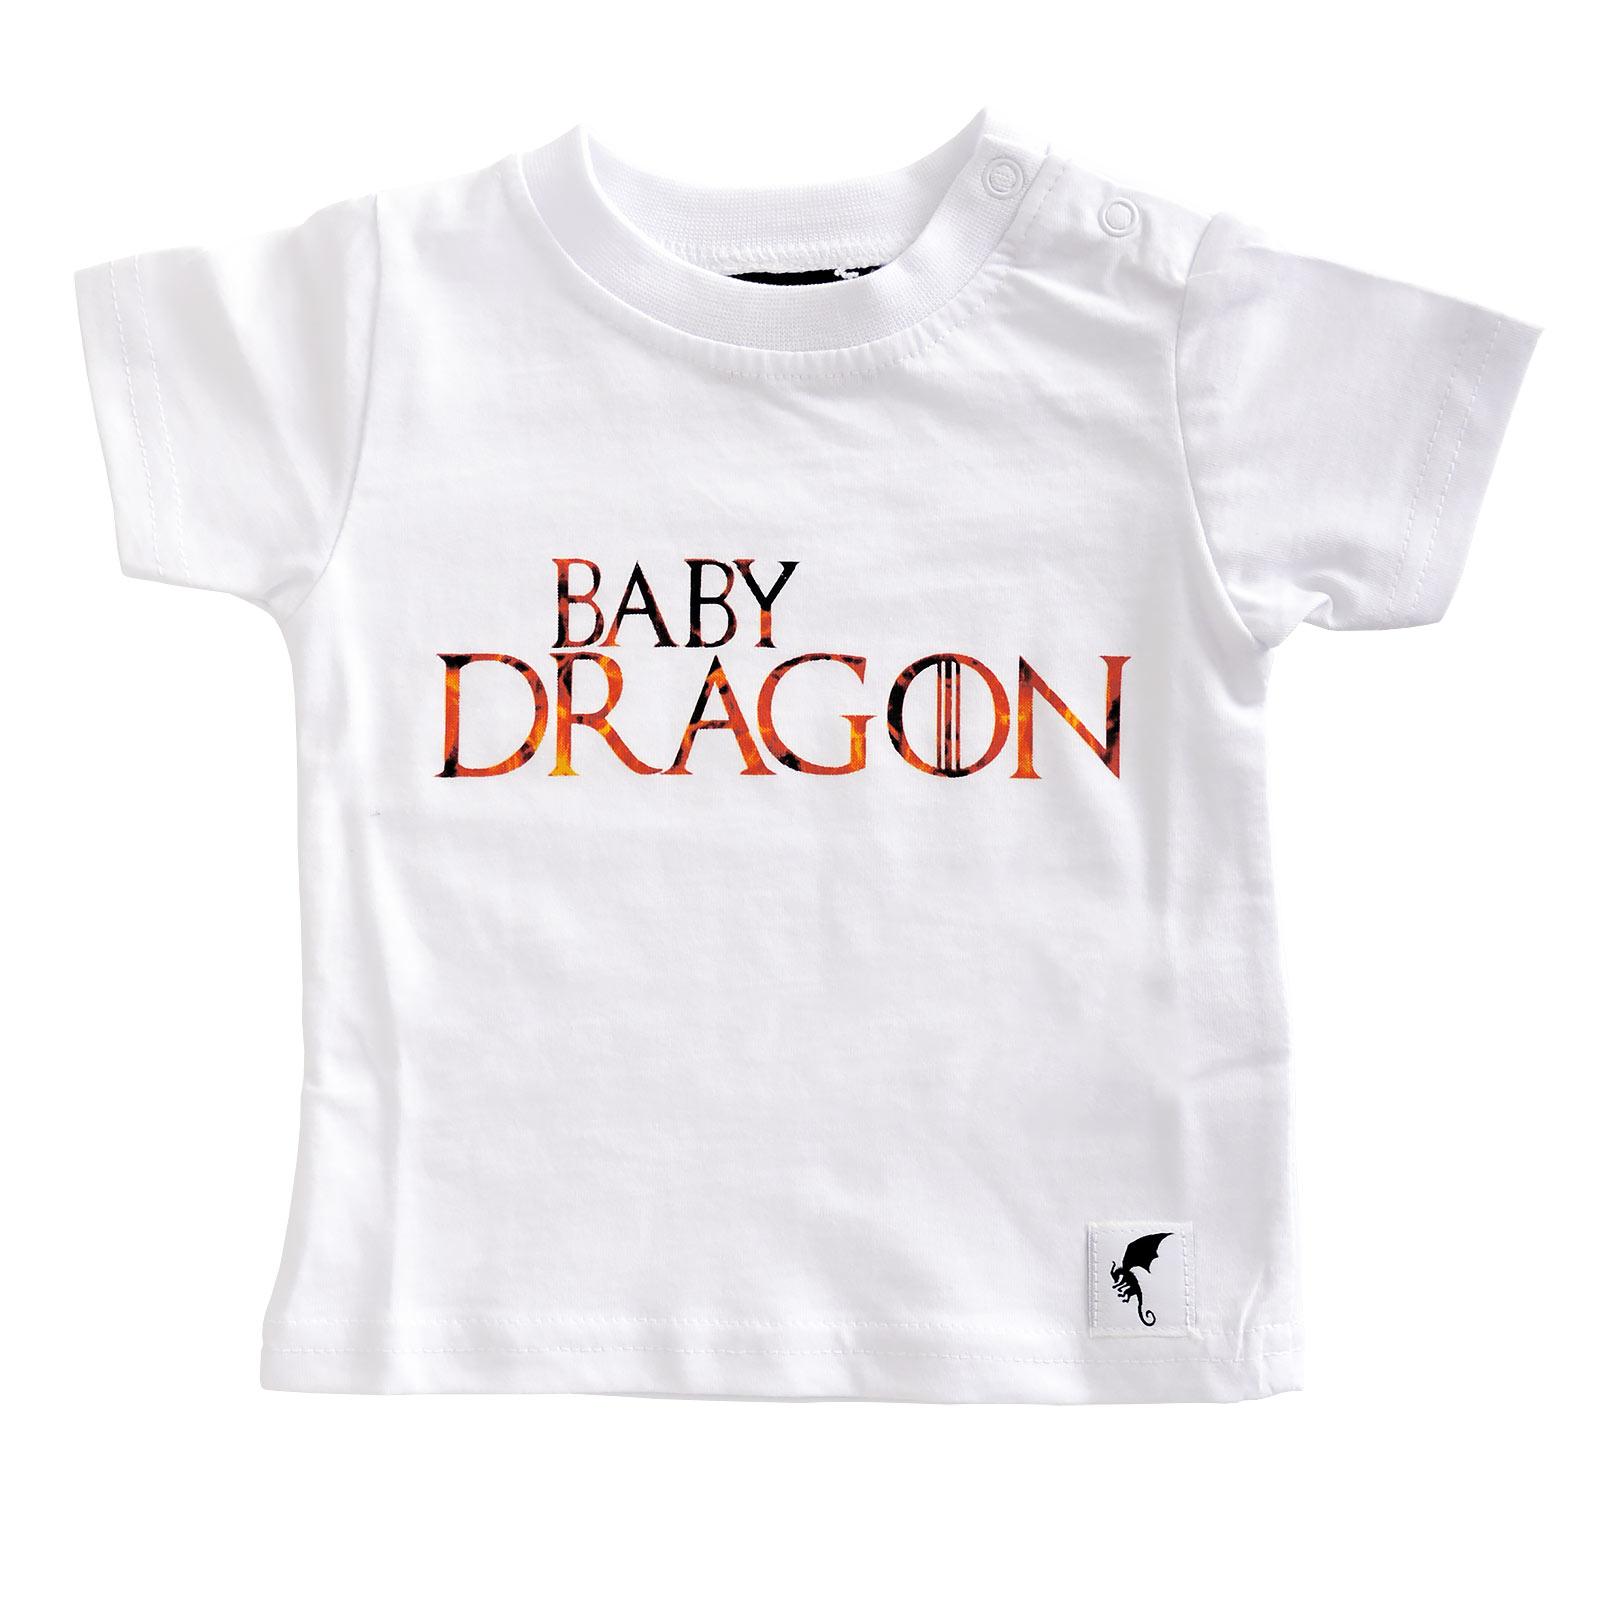 Baby Dragon - Kinder T-Shirt weiß